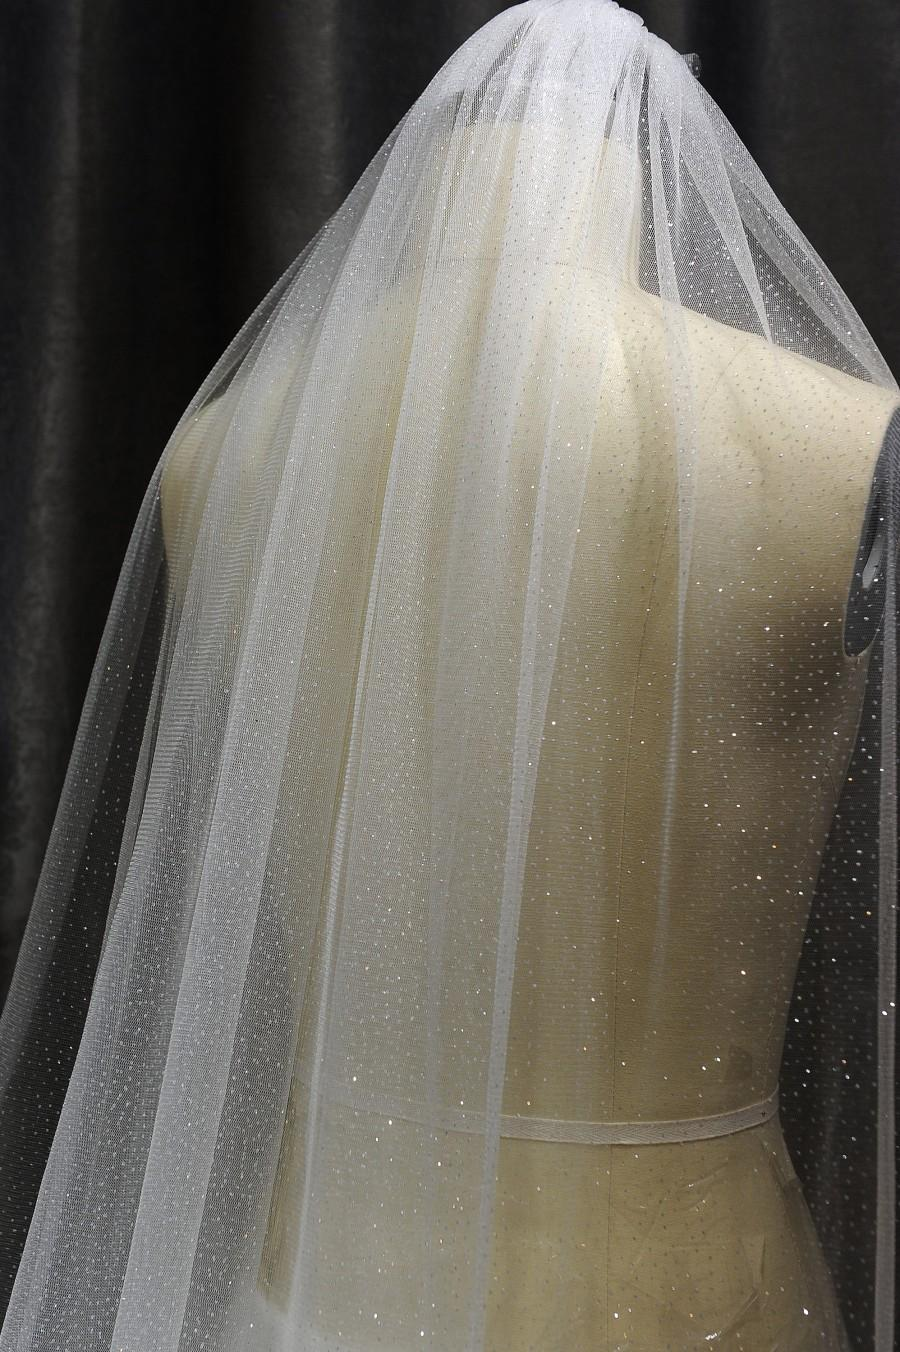 Mariage - Ls59/sparkle veil/ glitter veil/ 1 tier veil/ chapel veil/ cathedral veil/custom veil